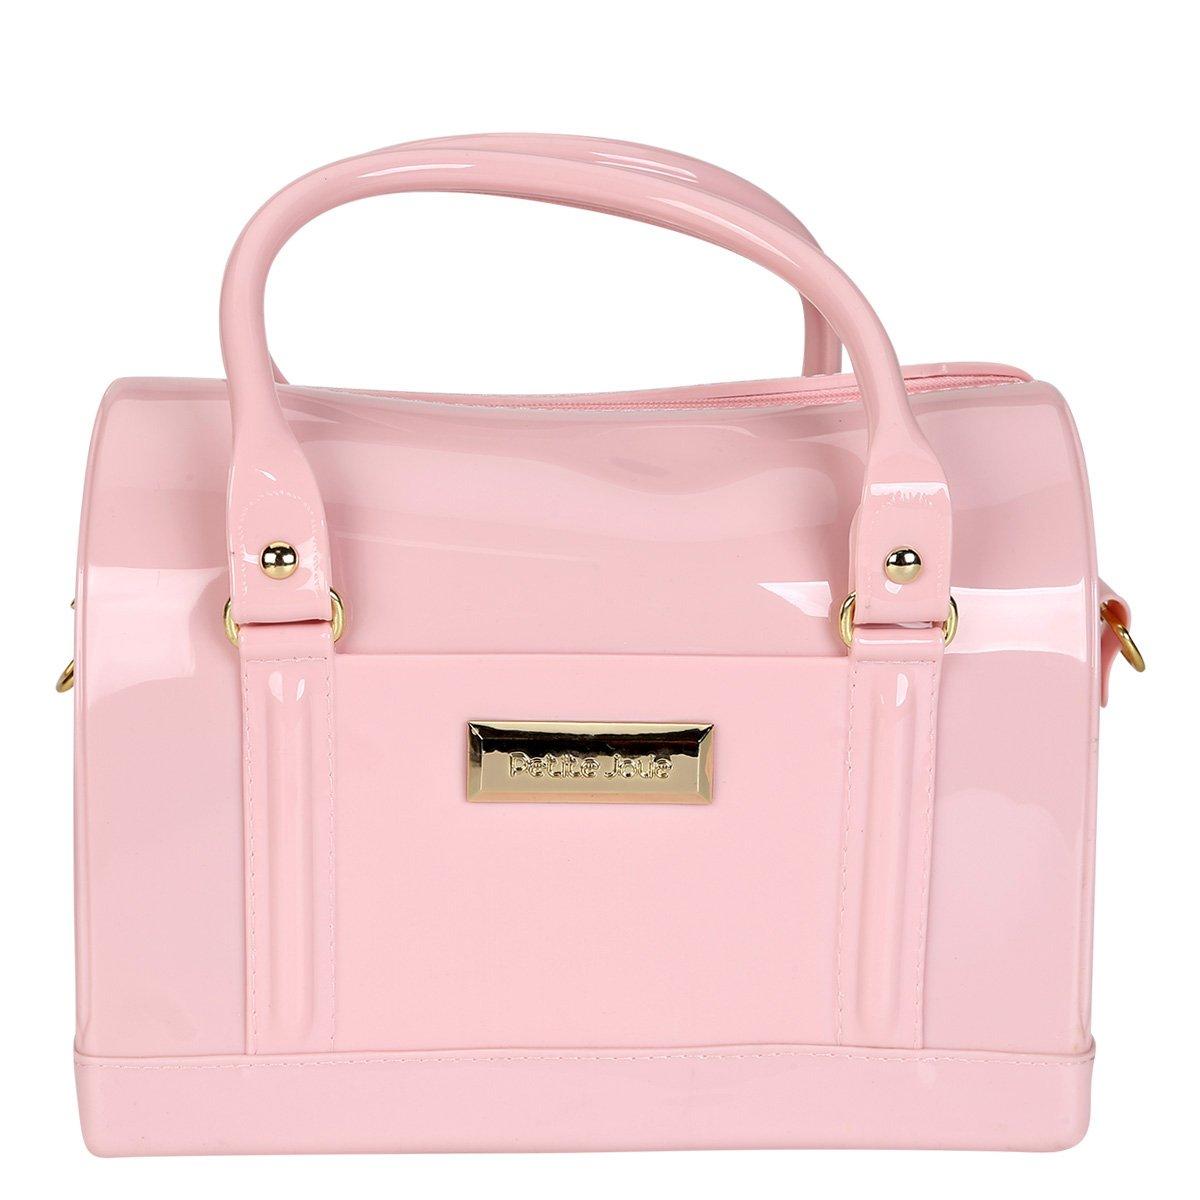 Bolsa De Mão Petite Jolie : Bolsa petite jolie ba? bloom feminina rosa